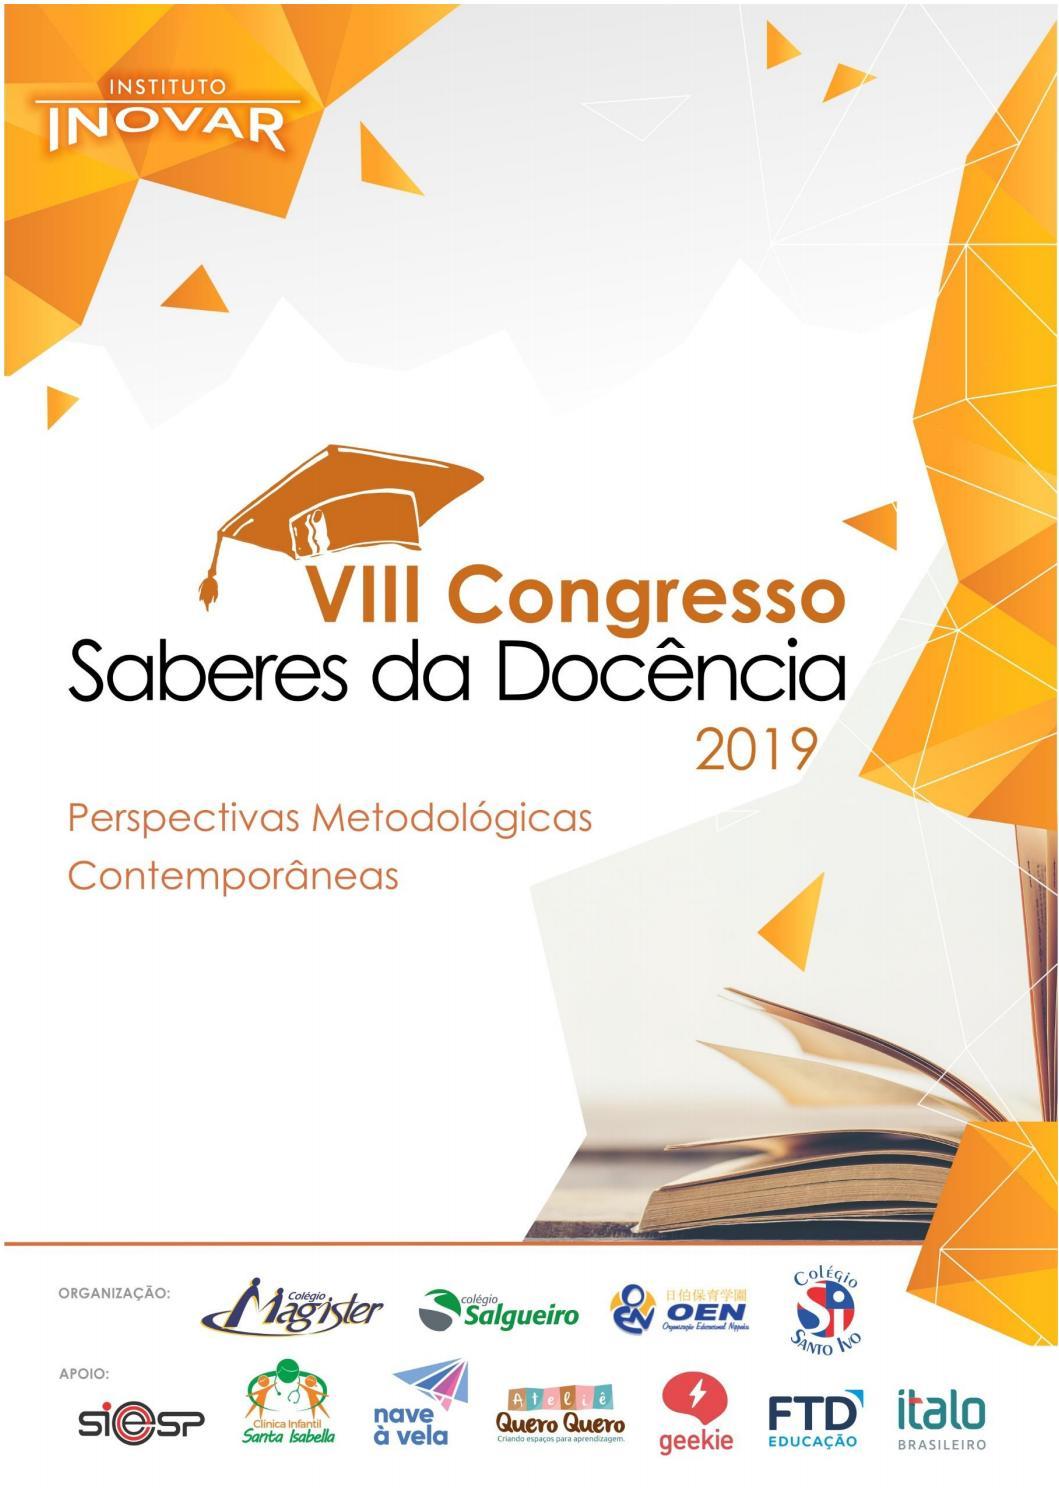 Folheto Viii Congresso By Inovar Instituto Issuu